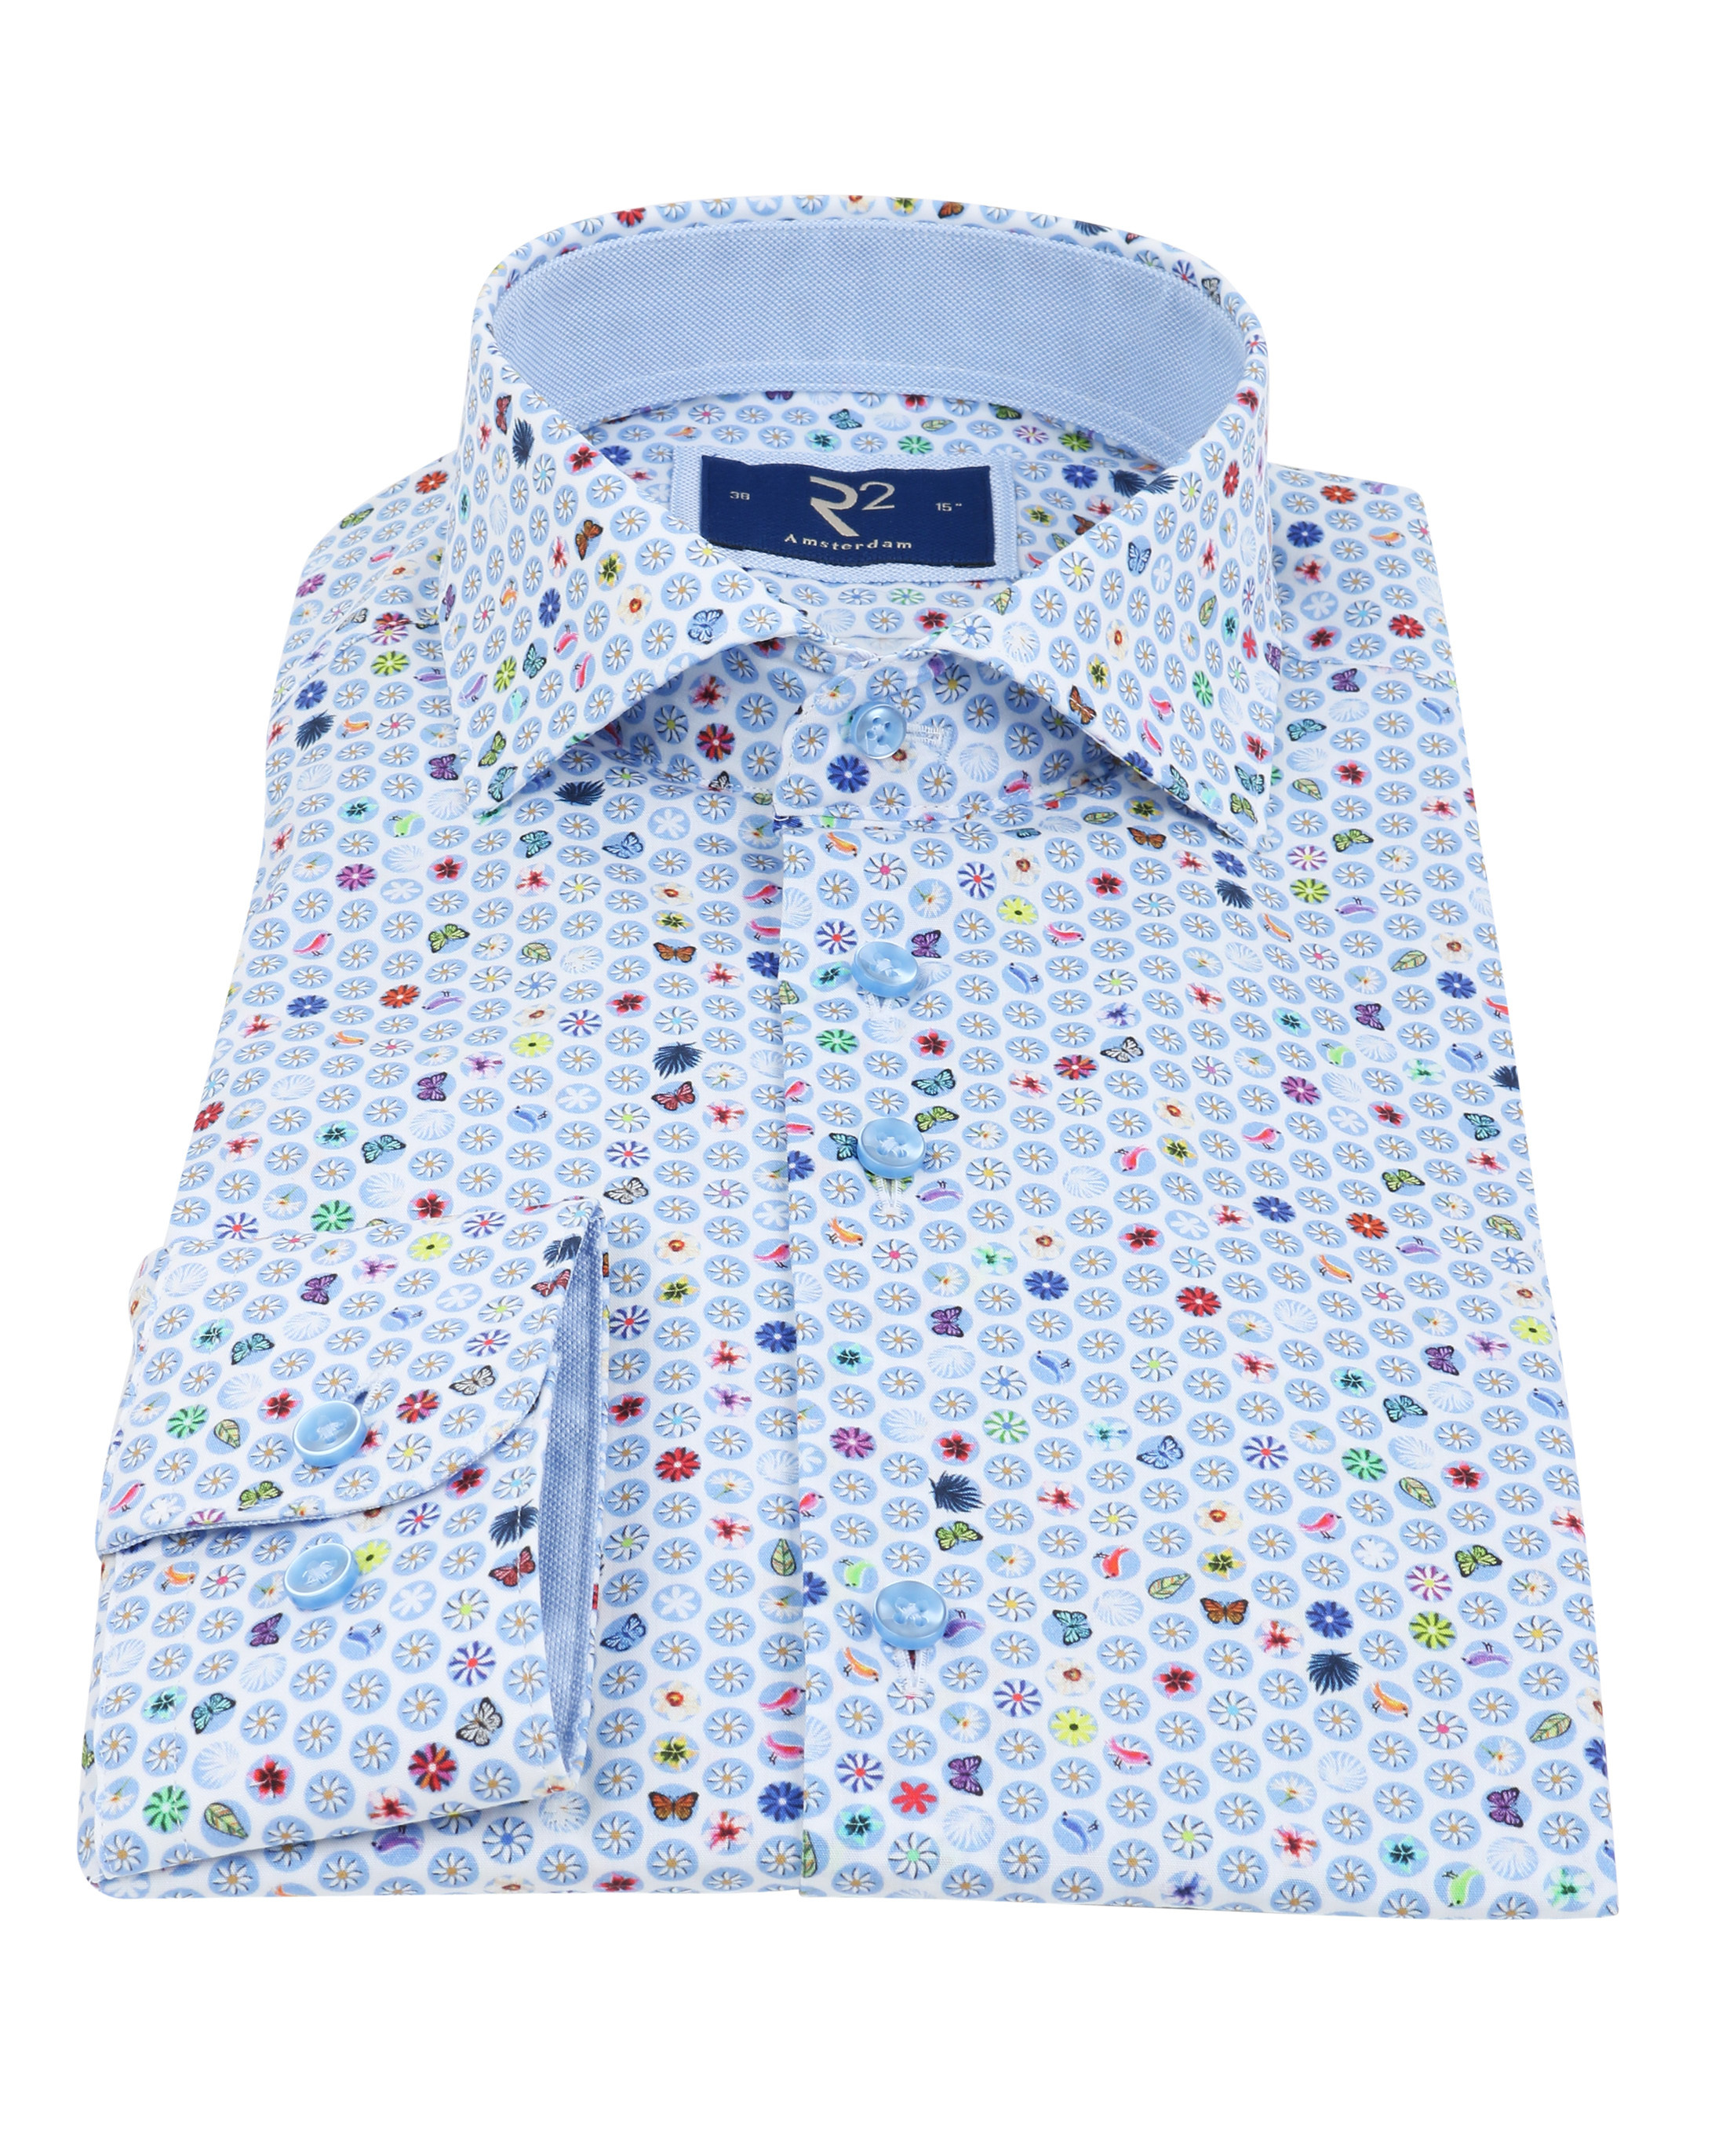 R2 Overhemd Zomers Blauw foto 2